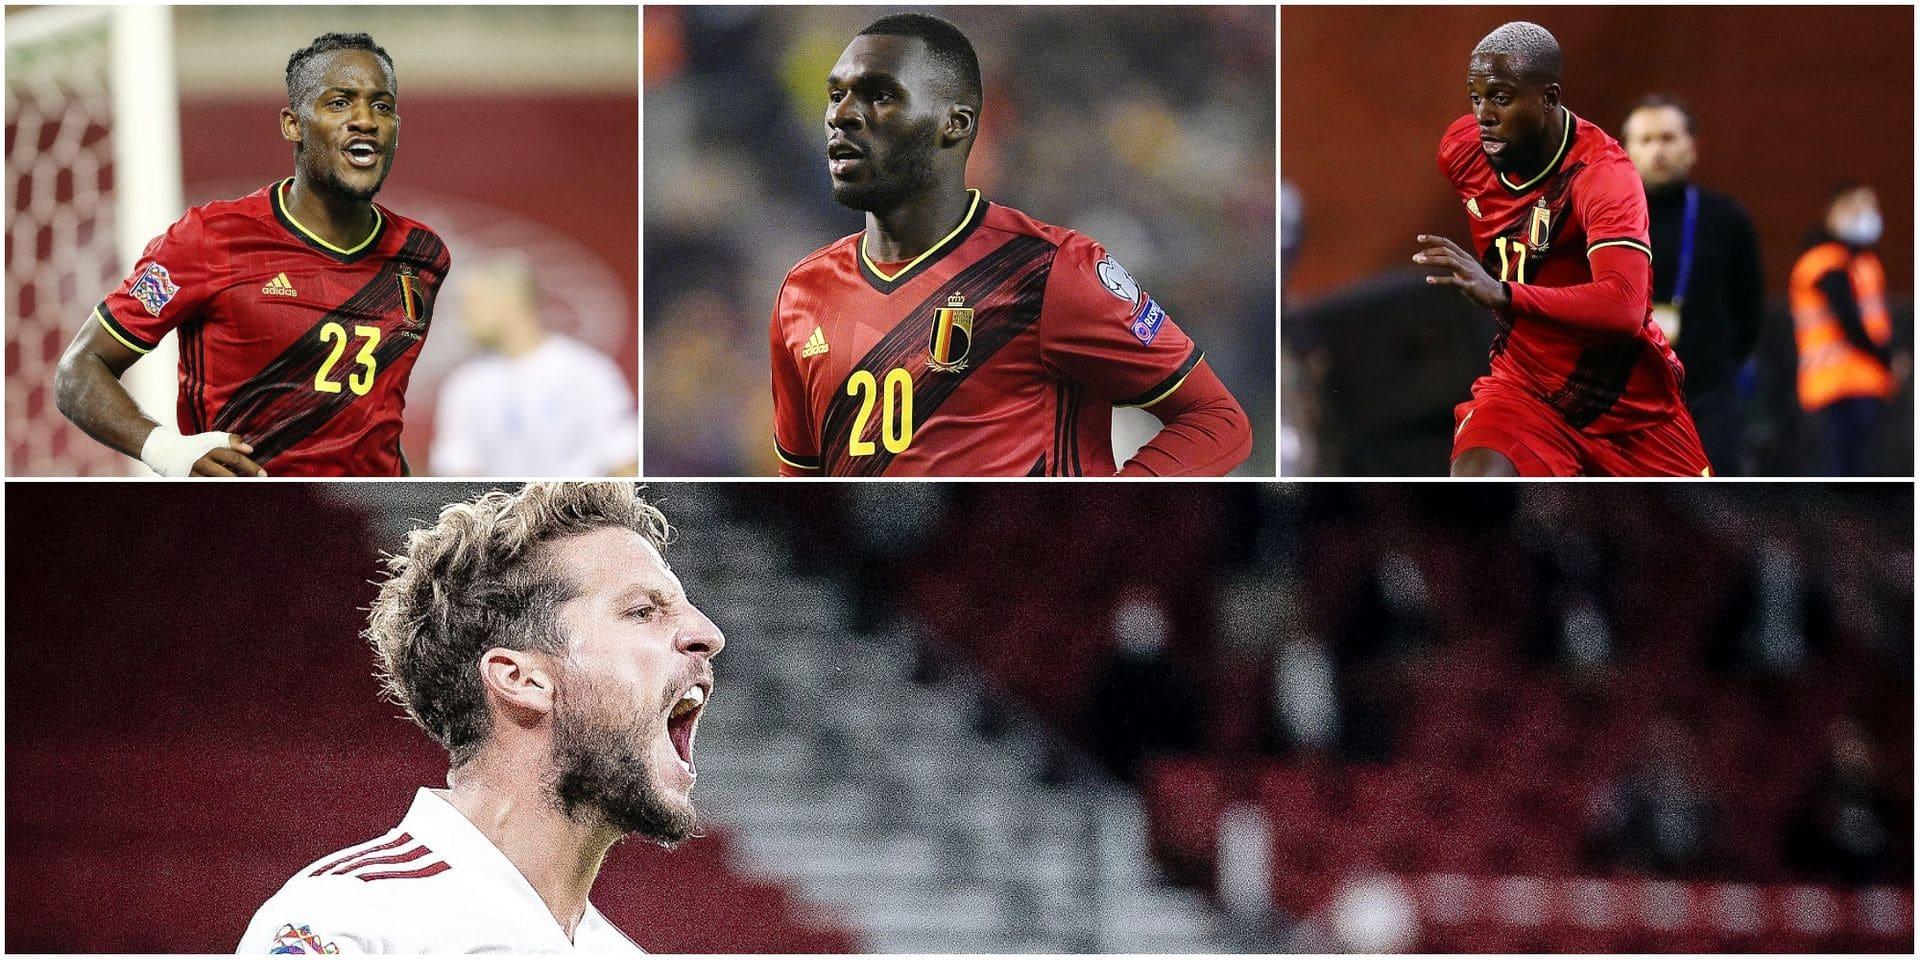 Batshuayi, Benteke, Mertens, De Ketelaere: qui pour doubler Lukaku chez les Diables ?